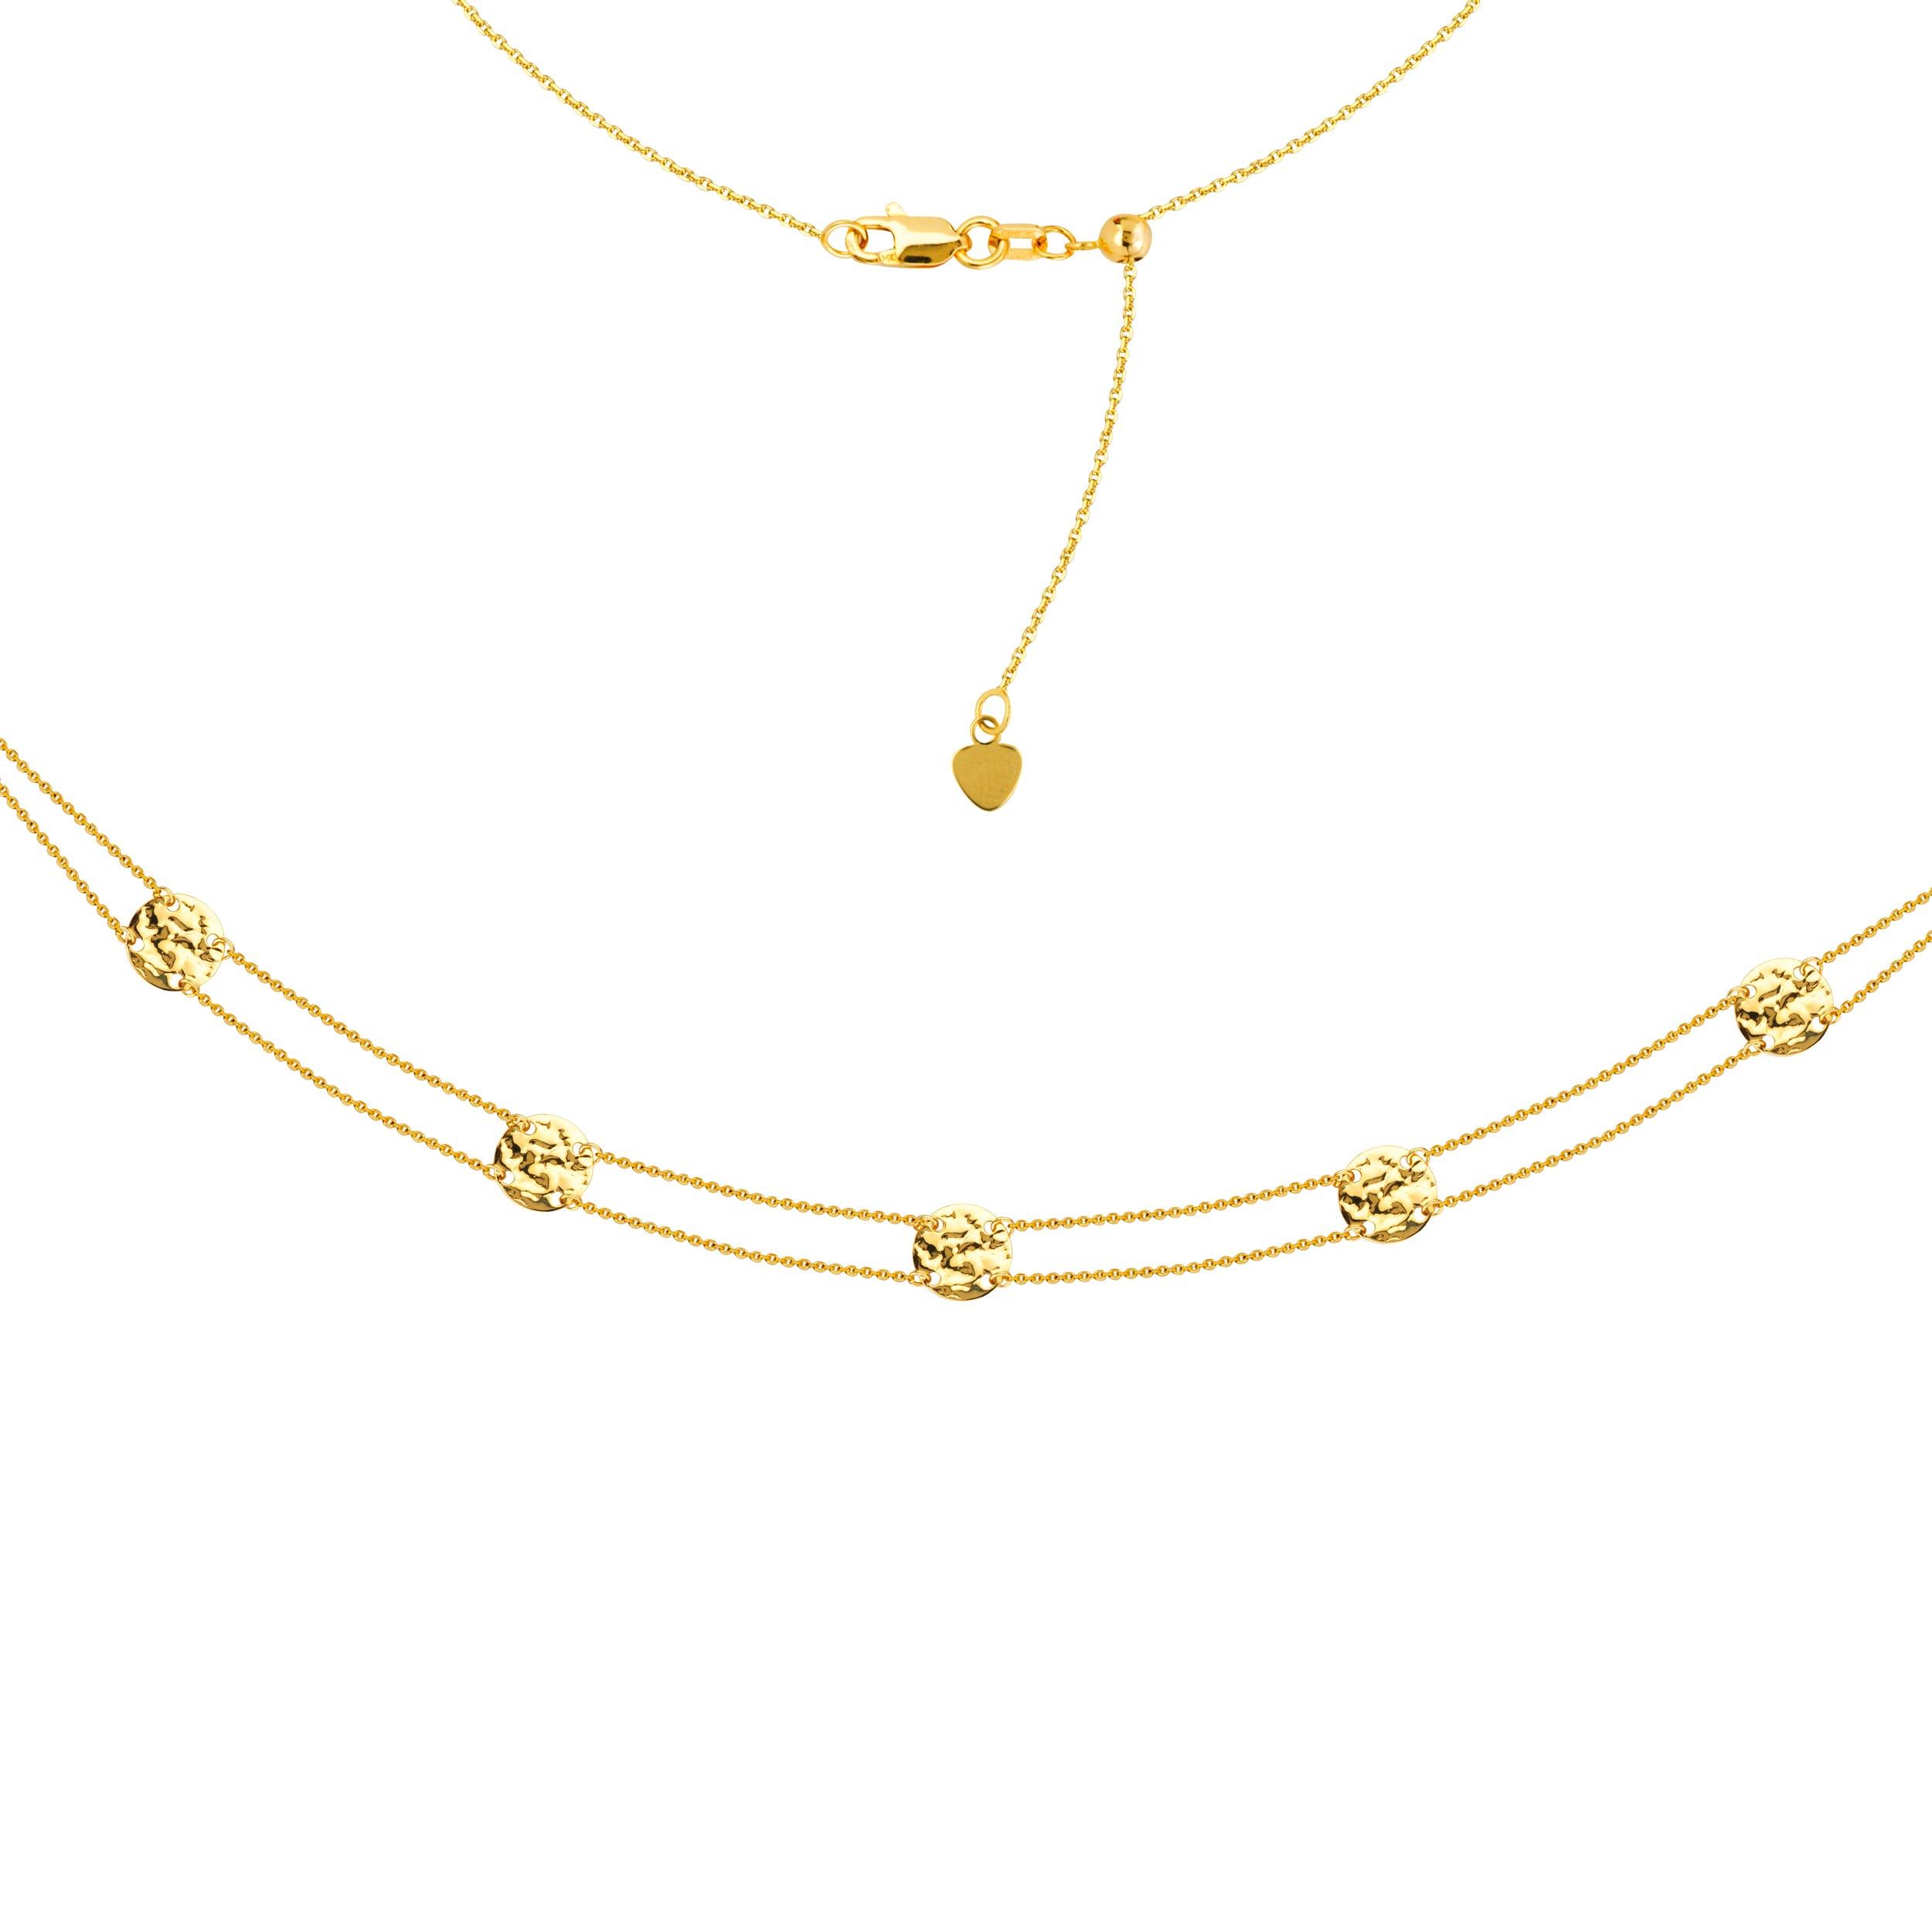 Ladies Hammered Disc Station Fashion Adjustable Choker Necklace